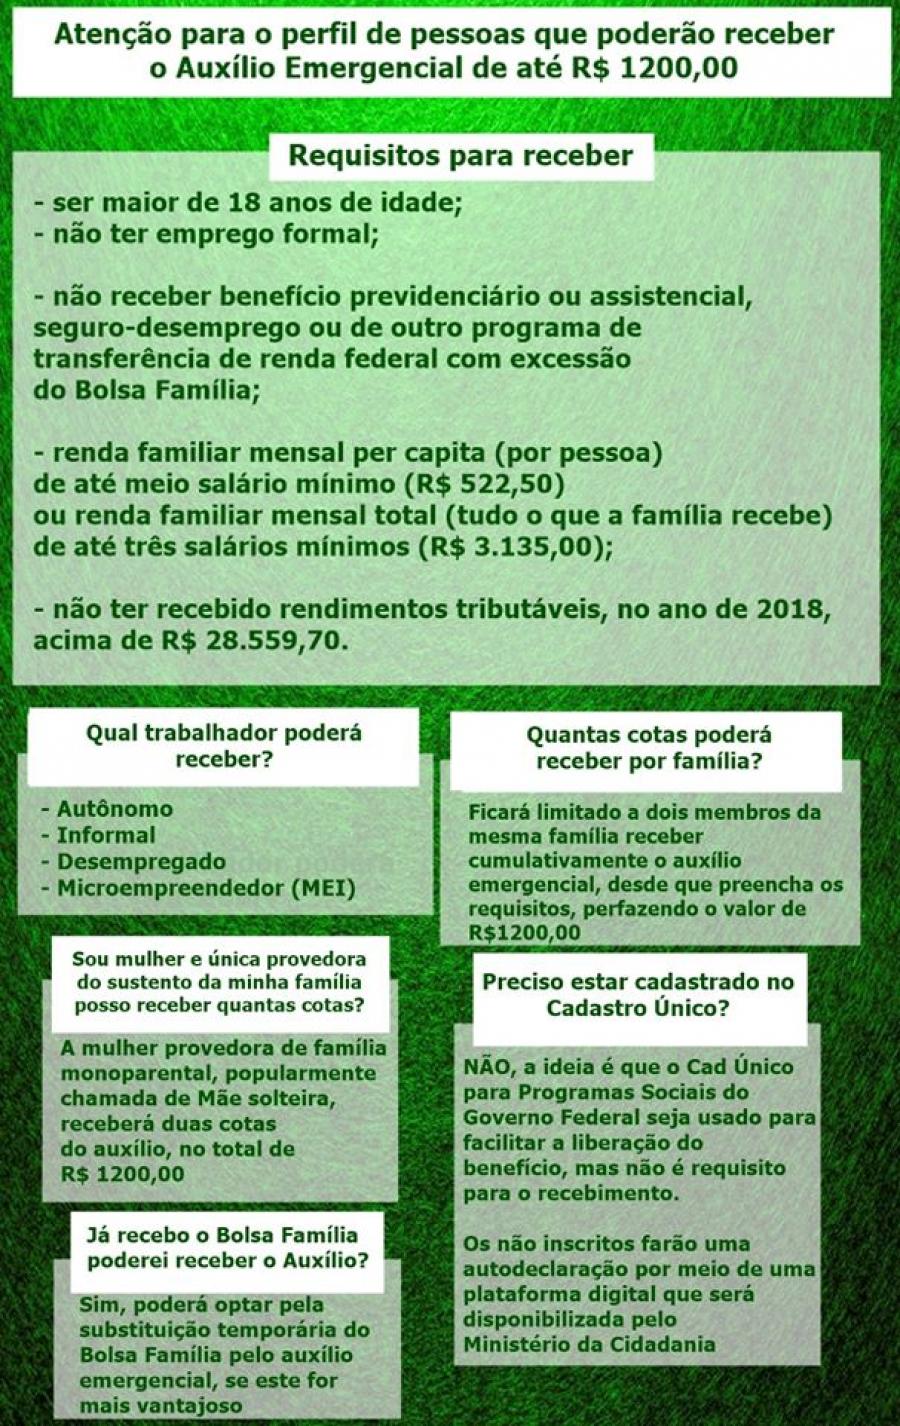 COMUNICADO -DEPARTAMENTO DE ASSISTENCIAL SOCIAL